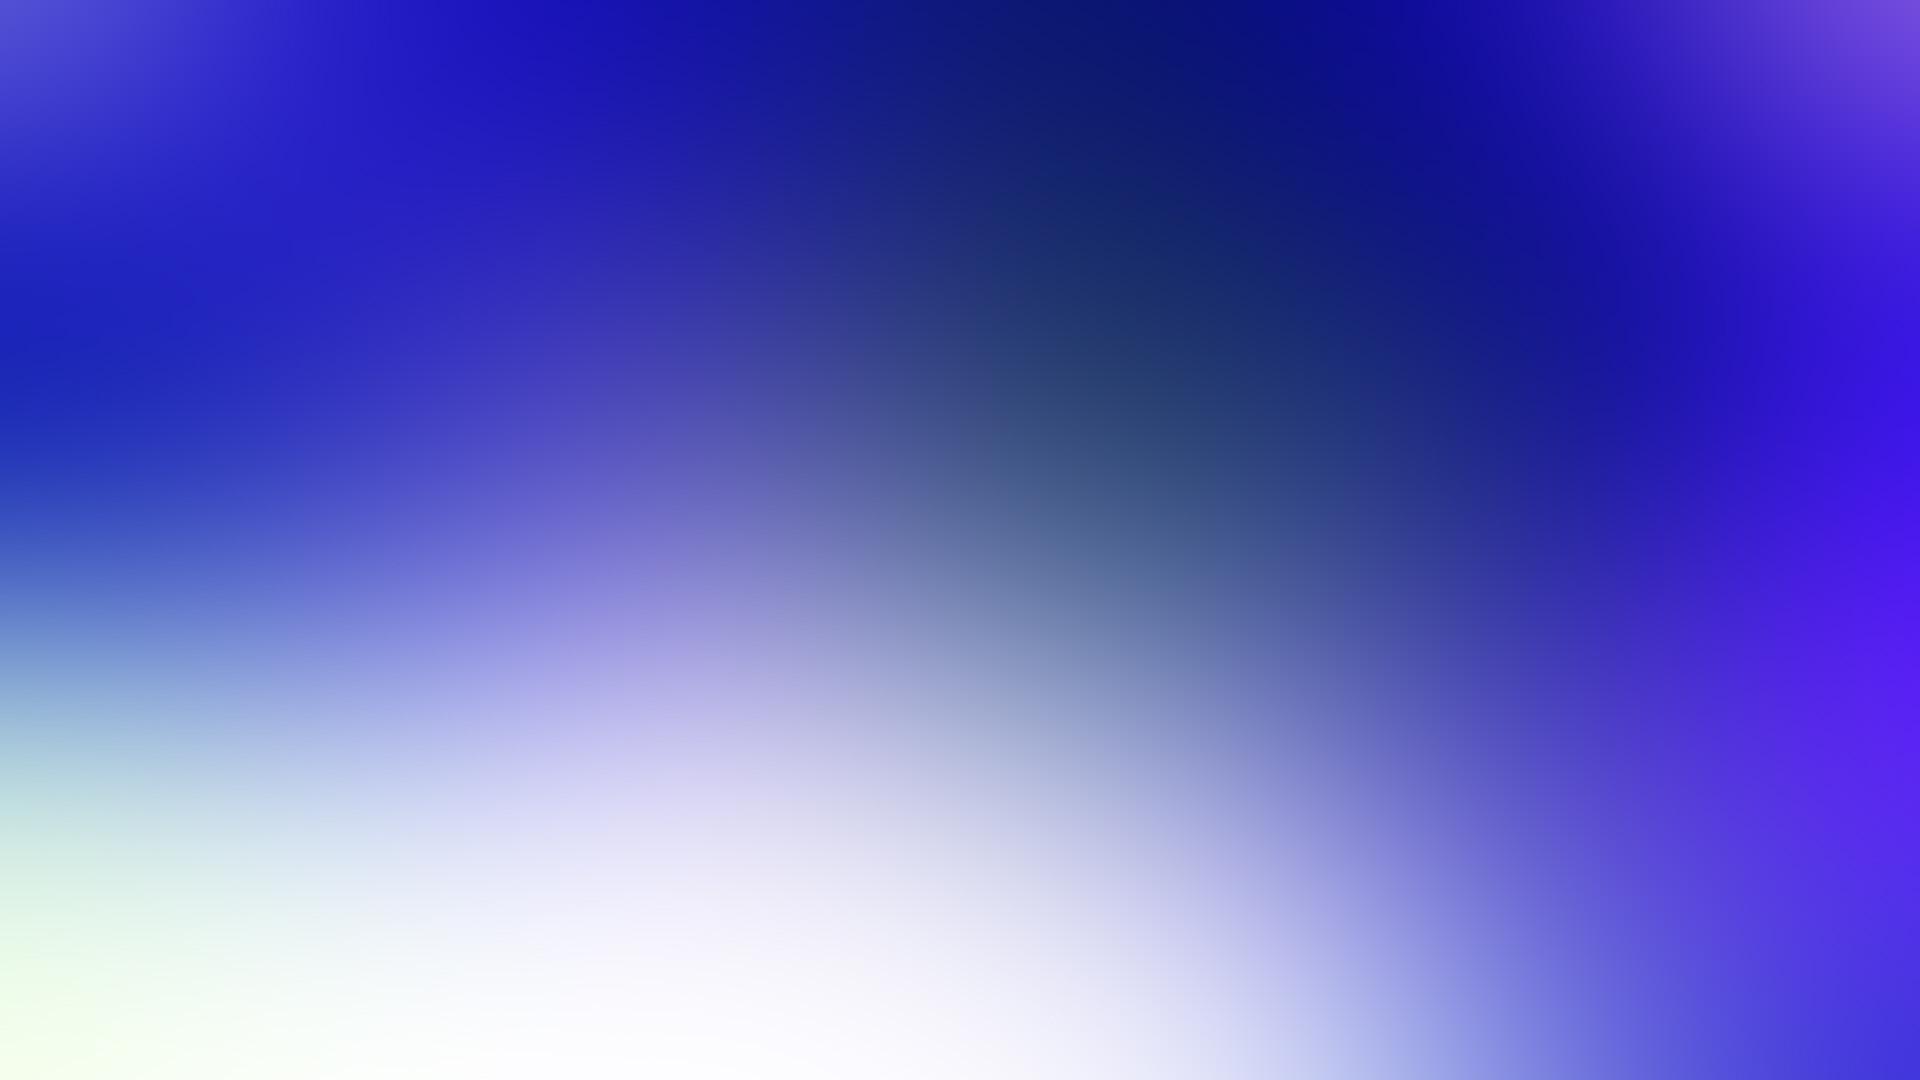 Fond d'écran : bleu, blanc, Taches, abstraction 1920x1080 - 4kWallpaper - 644434 - Fond d'écran ...